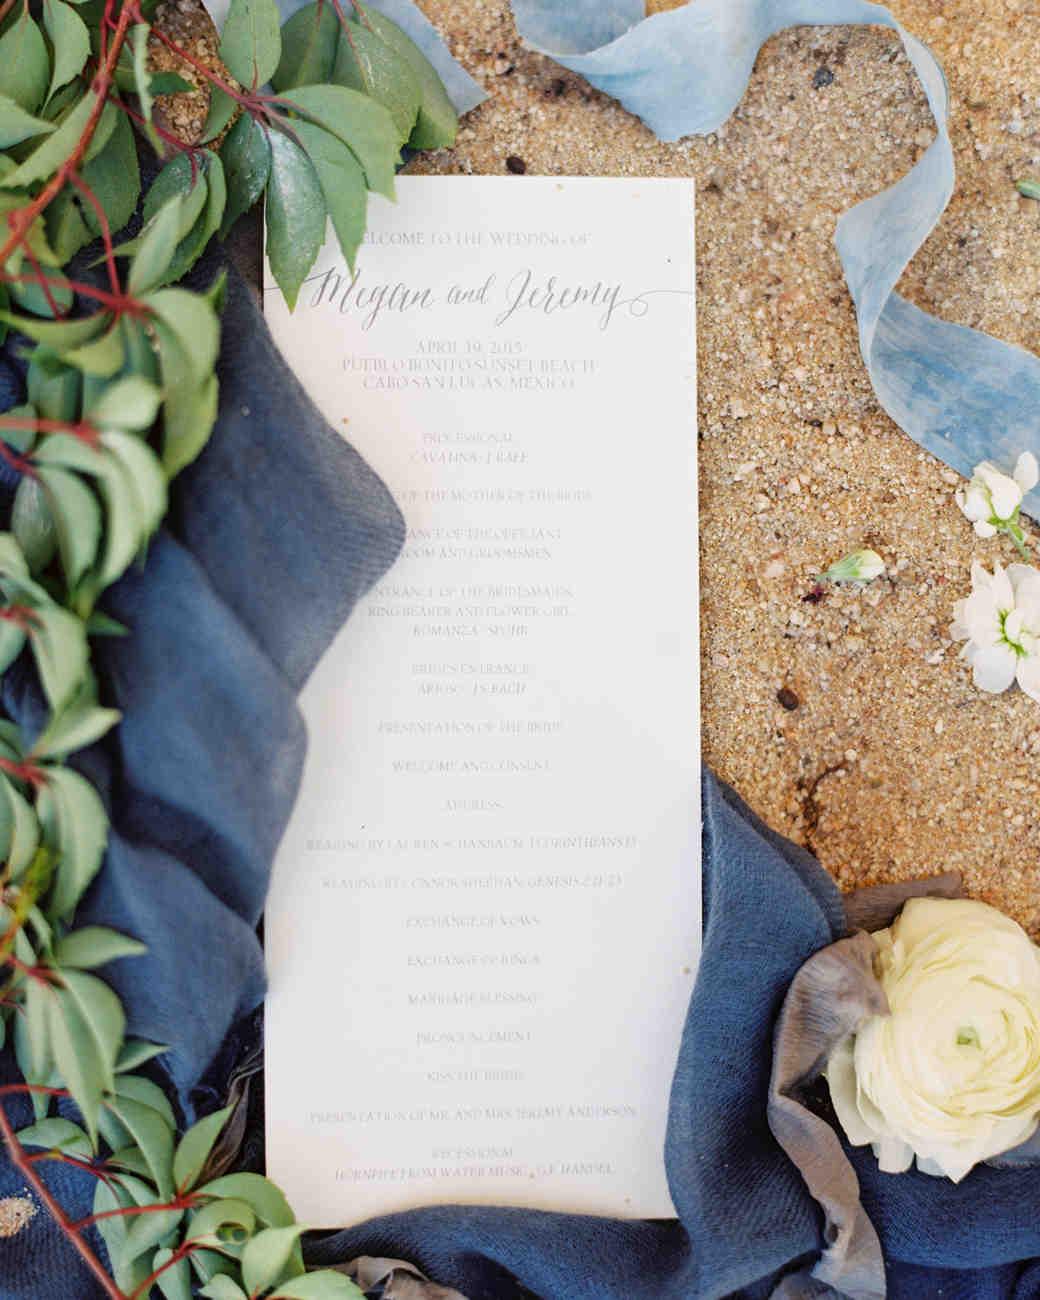 megan-jeremy-wedding-program-09-s112680-0216.jpg